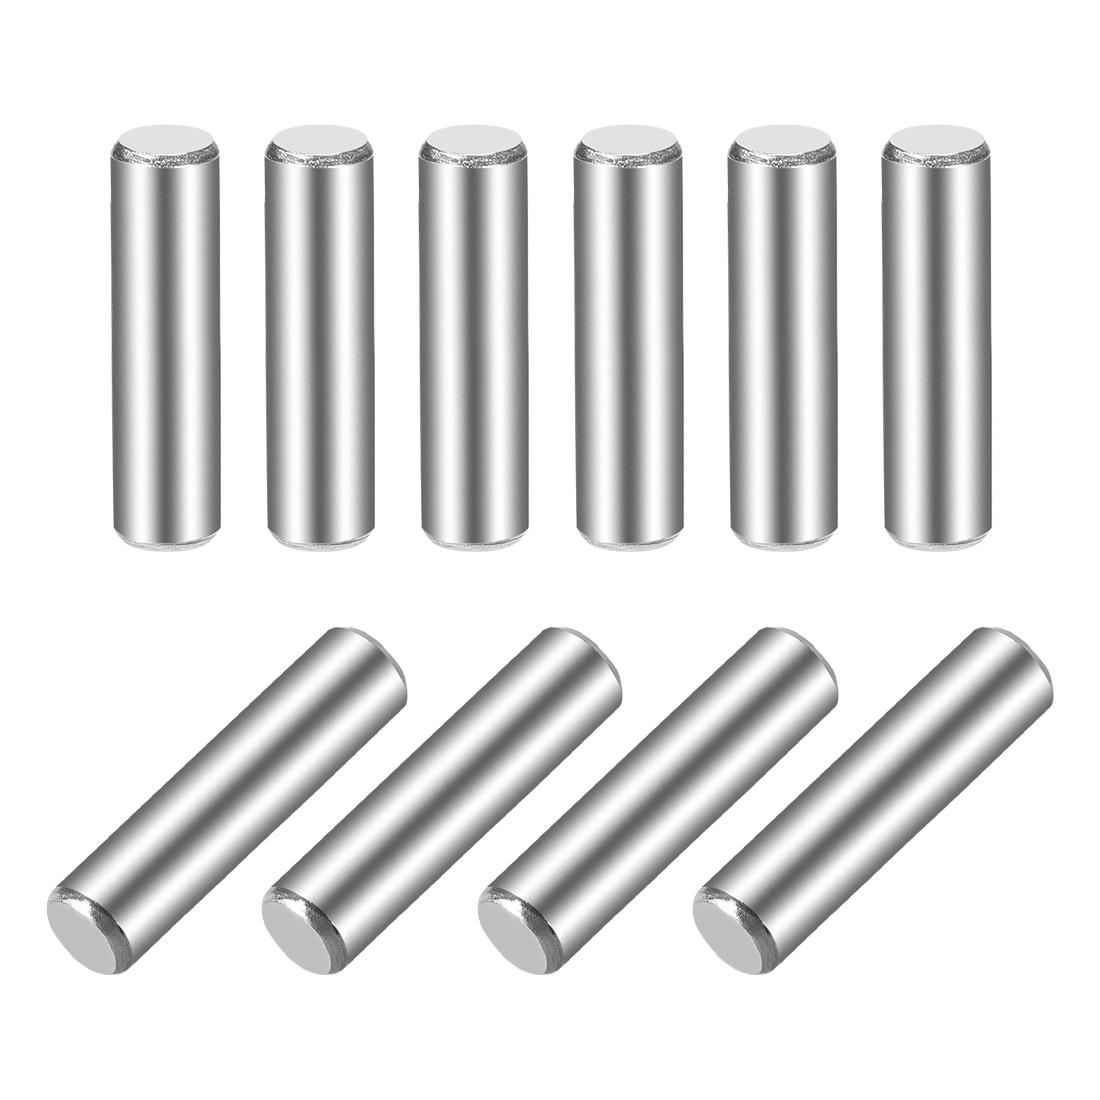 10Pcs 5mm x 20mm Dowel Pin 304 Stainless Steel Shelf Support Pin Fasten